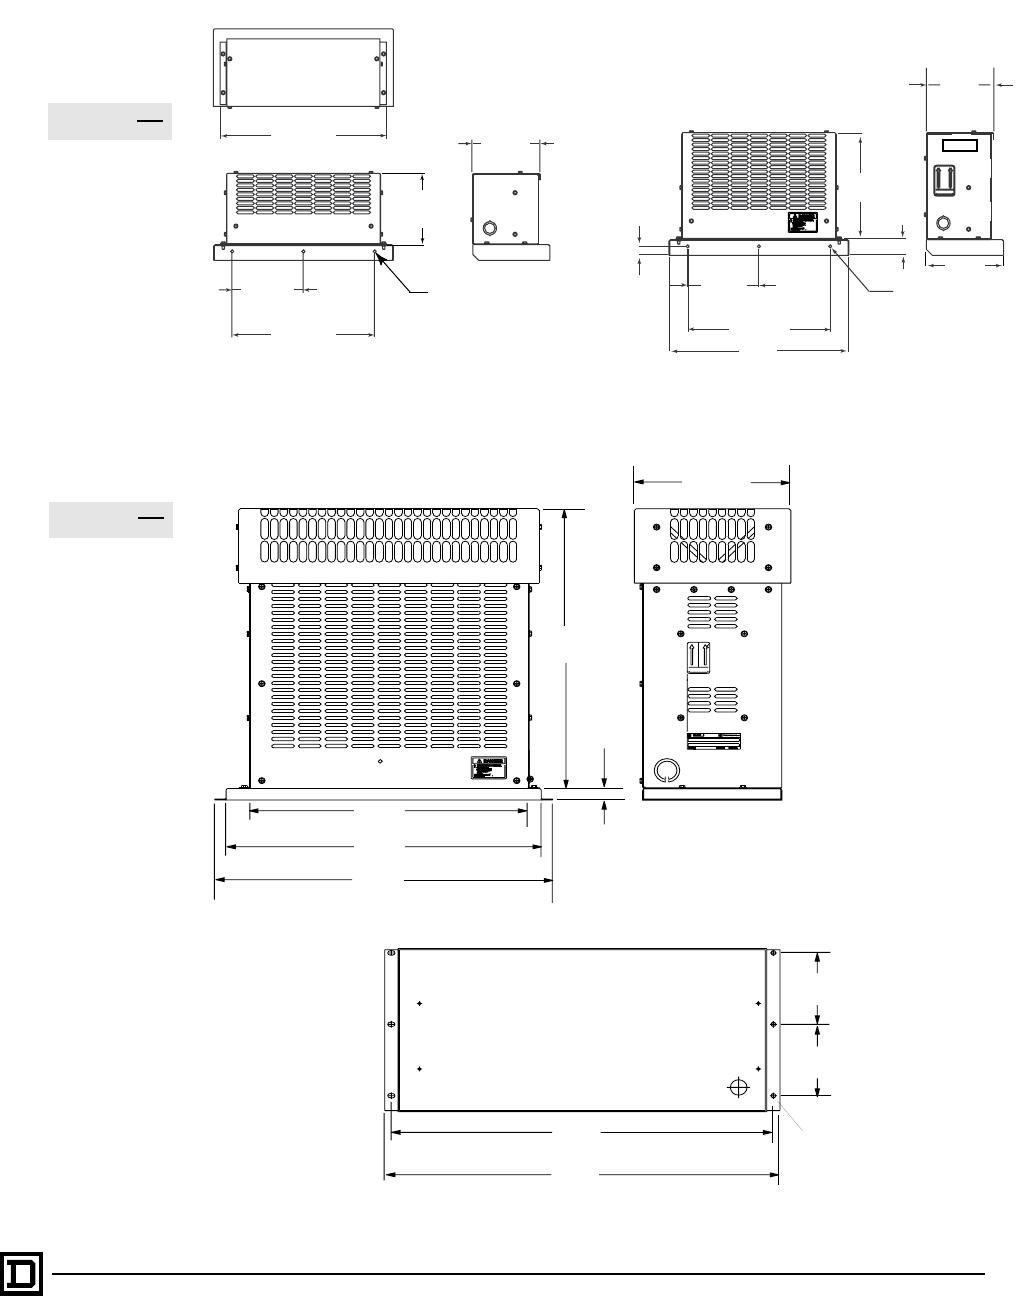 1000298892 Catalog 277 Volt Light Wiring Diagram In Addition Hoa Switch Altivar 66 Ac Drives